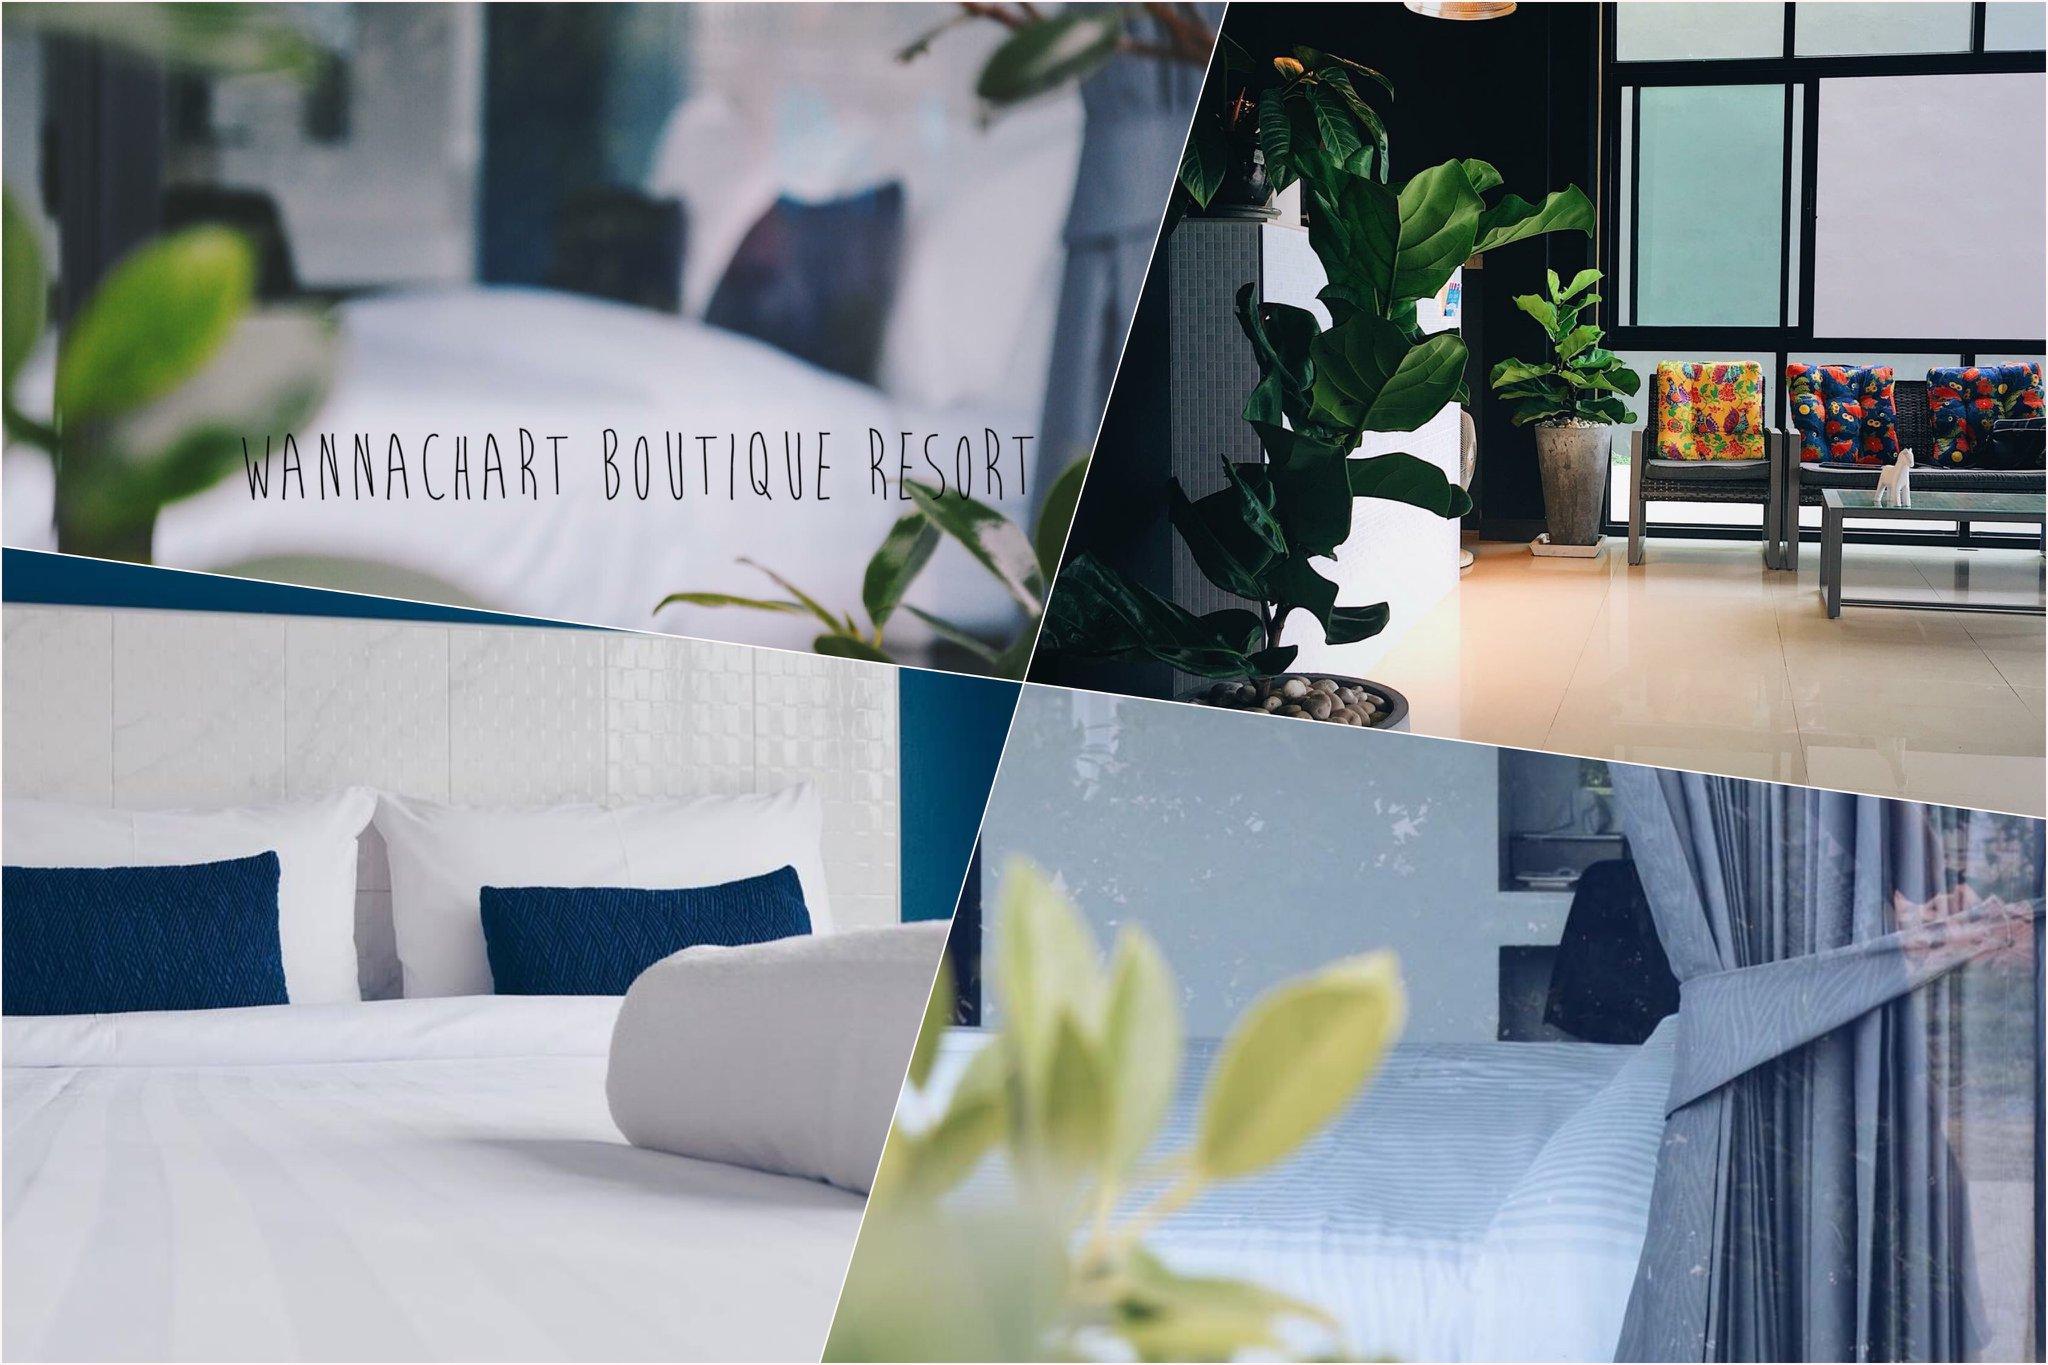 27.-Wannachart-Boutique-Resort-ที่พักเด็ดใหม่-ใจกลางท่าศาลา-รายละเอียด-คลิก แหล่งท่องเที่ยว,นครศรี,จุดเช็คอิน,จุดถ่ายรูป,คาเฟ่,ของกิน,จุดกิน